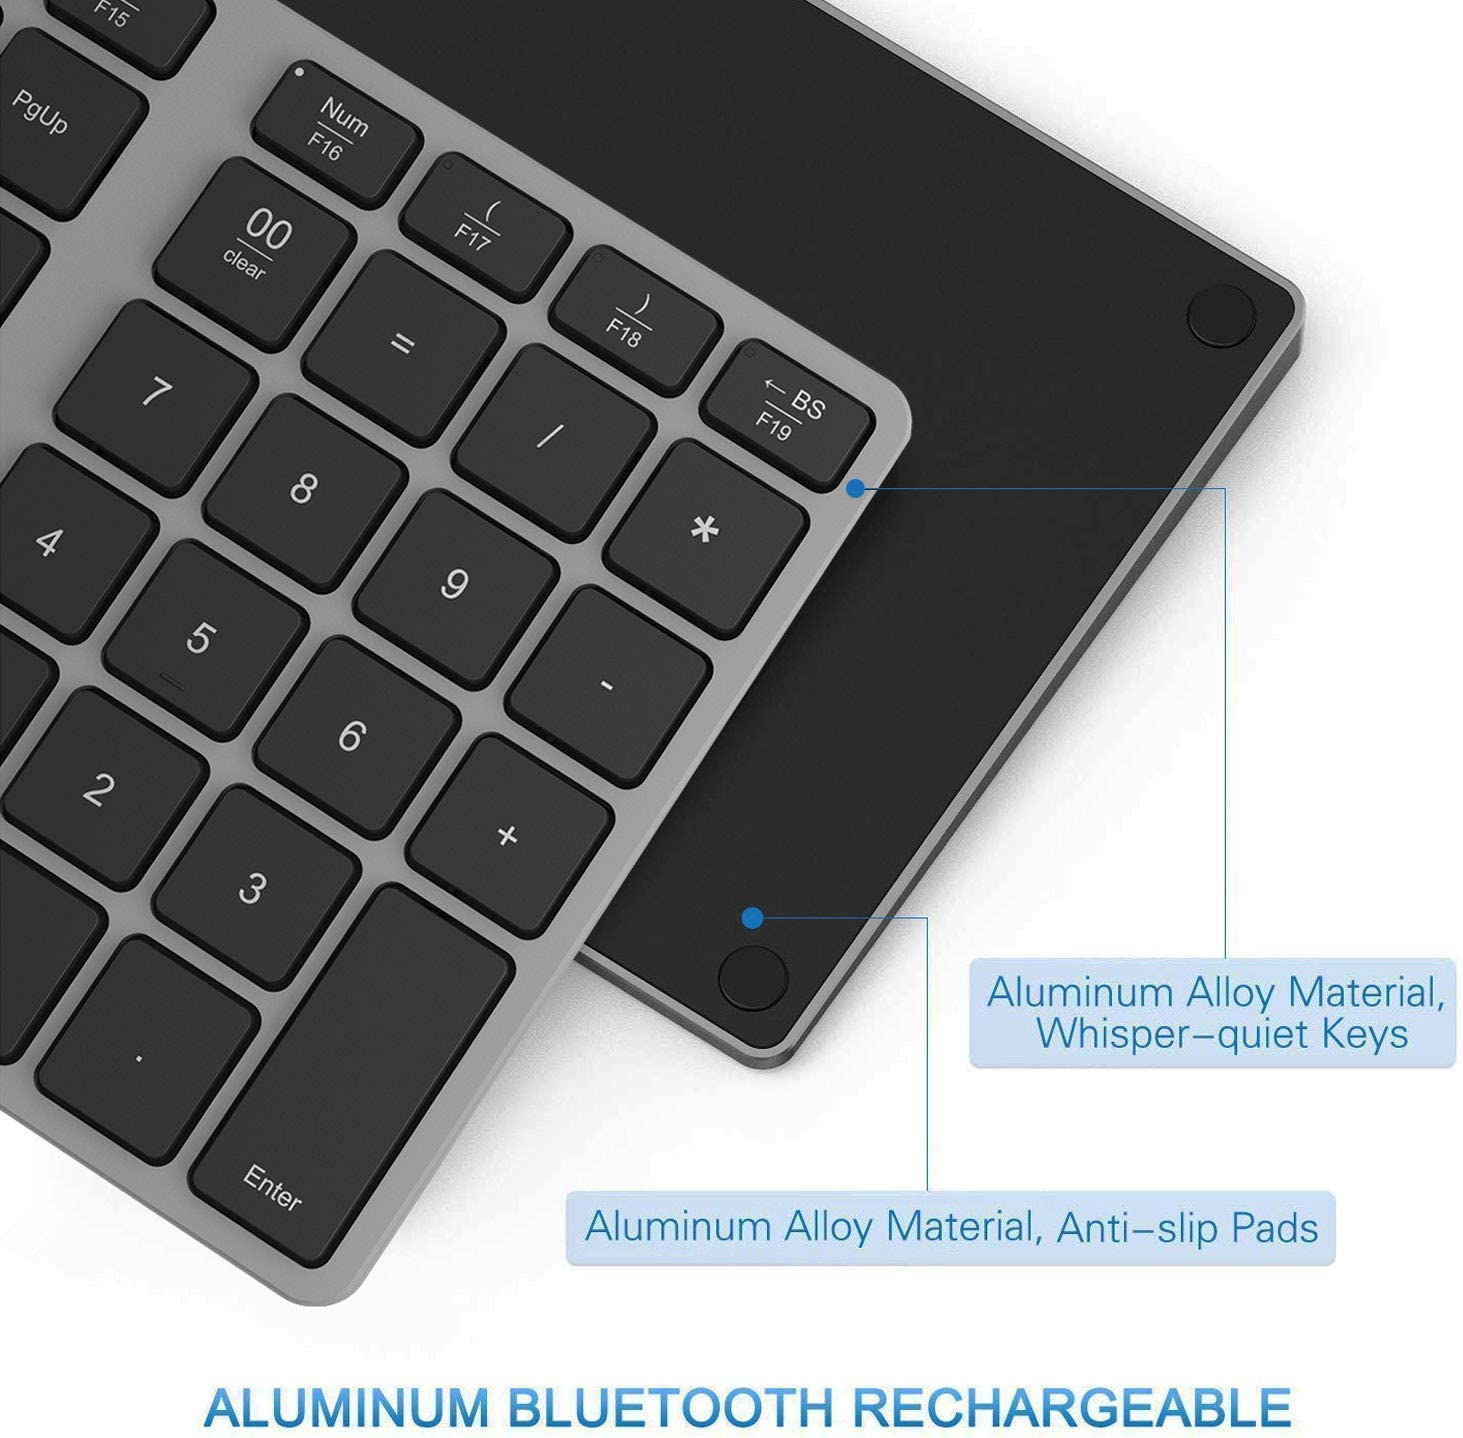 Programmable Bluetooth Number Pad Macbook Air//Pro Acedada Portable Slim 35-Keys External 10 Key Numpad Keyboard for Laptop Aluminum Rechargeable Bluetooth Wireless Numeric Keypad etc iMac Windows